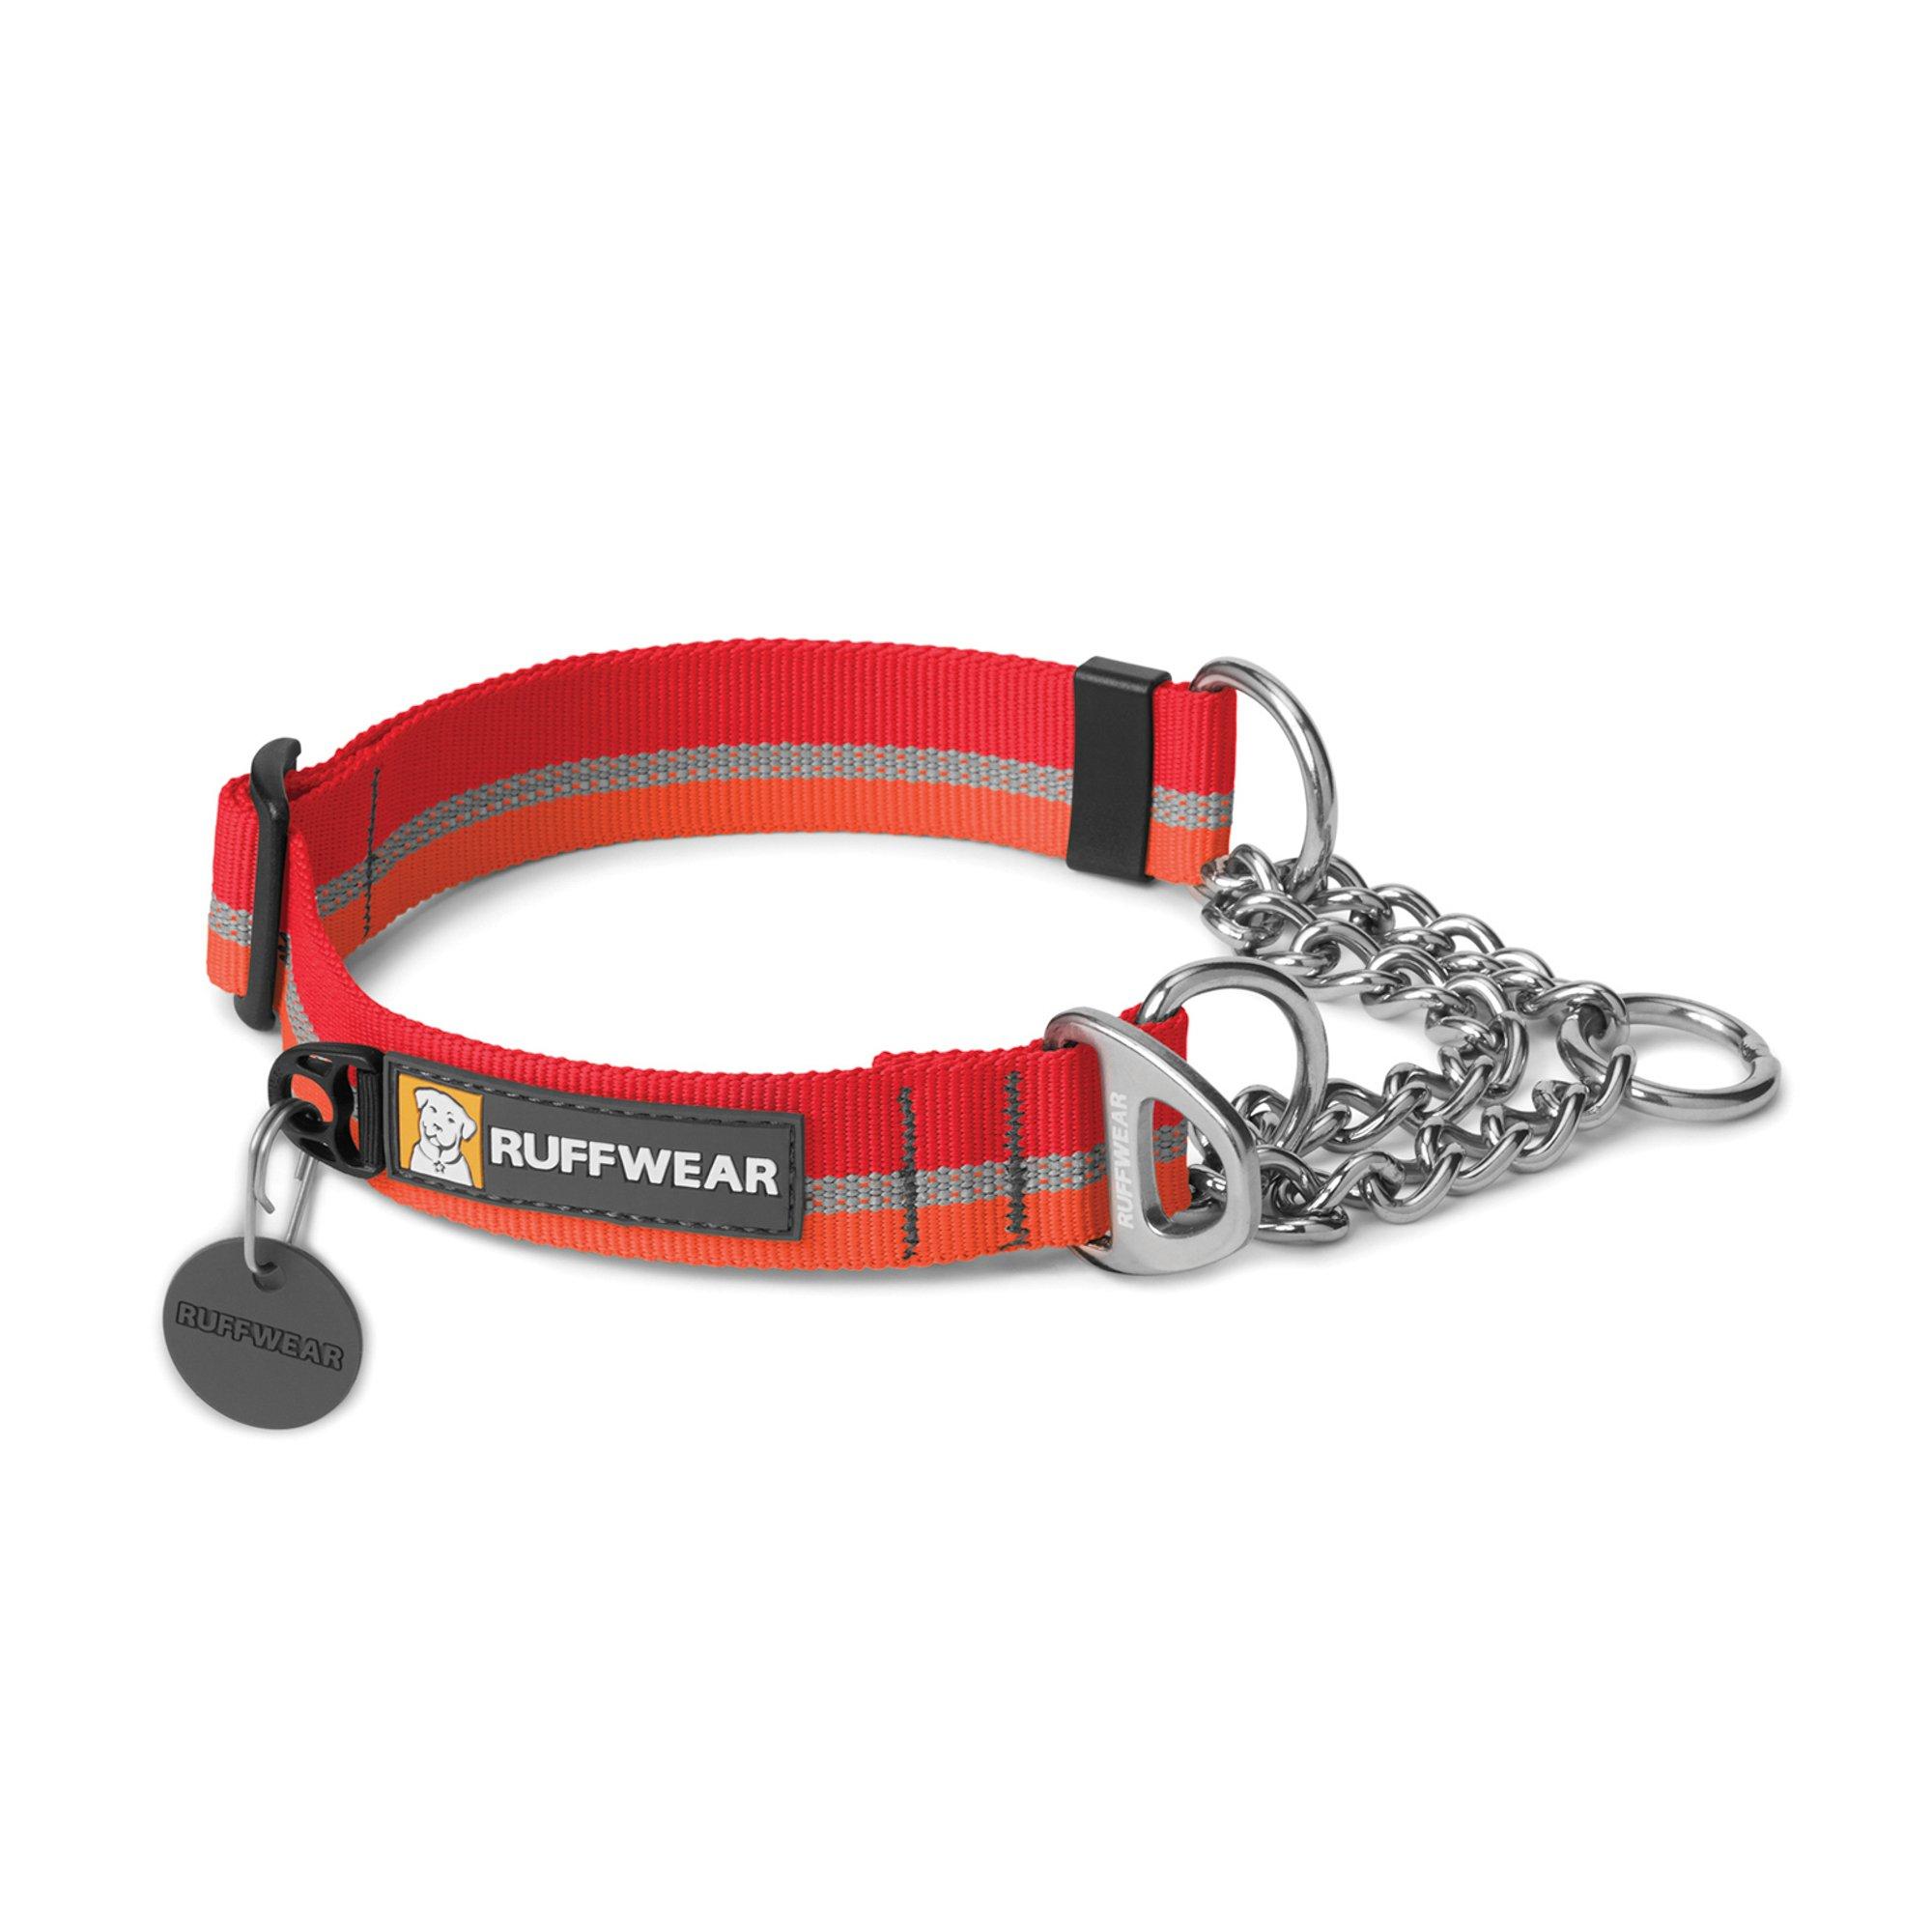 RUFFWEAR - Chain Reaction Limited Cinch, Audible Correction Collar, Kokanee Red, Medium